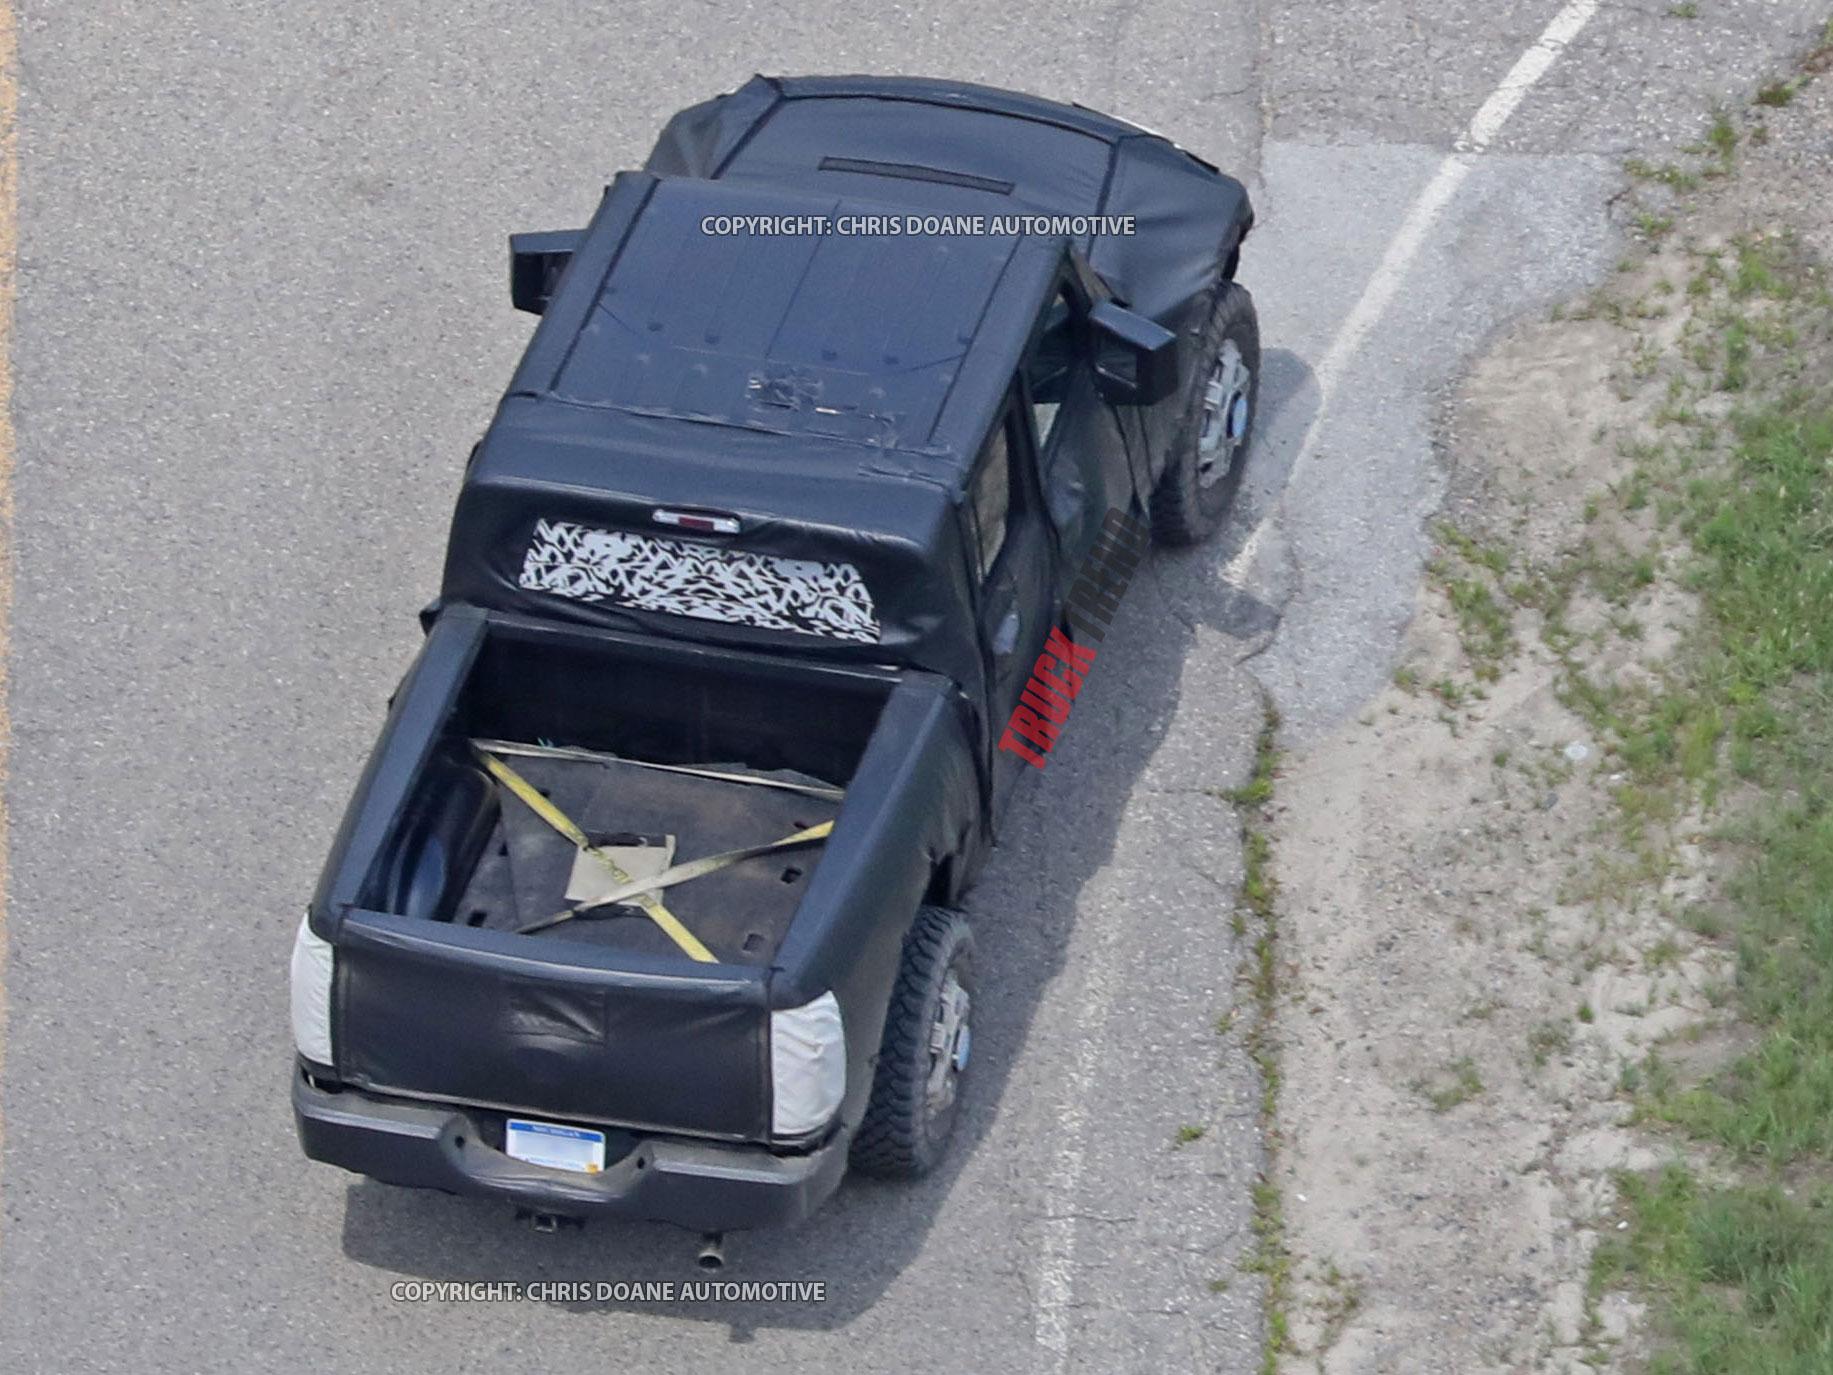 2019 Jeep Wrangler JL Pickup Spyshots 30